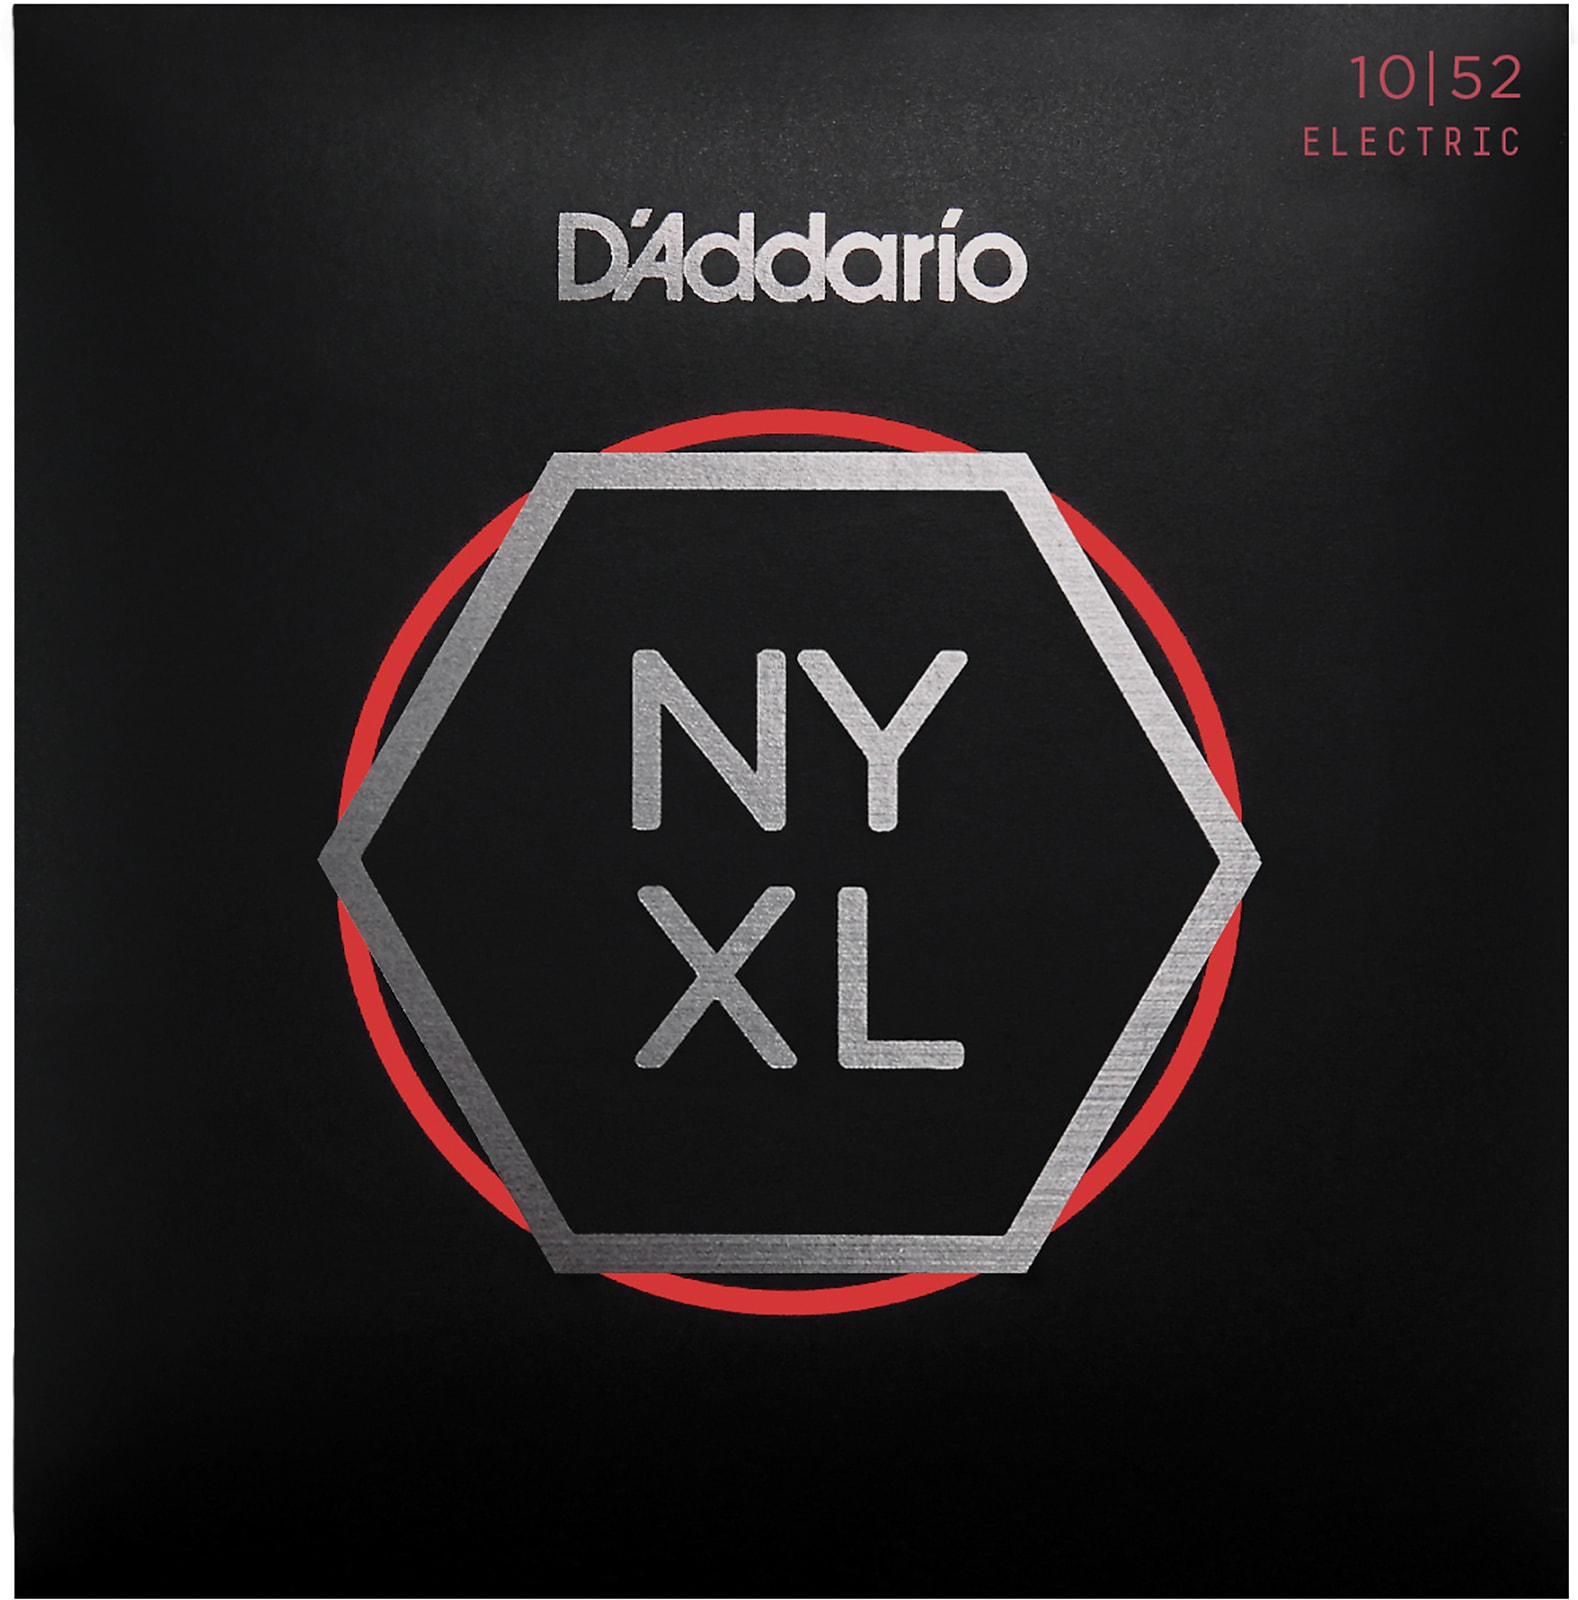 D'Addario NYXL1052 Nickel Wound Electric Guitar Strings, Light Top / Heavy Bott